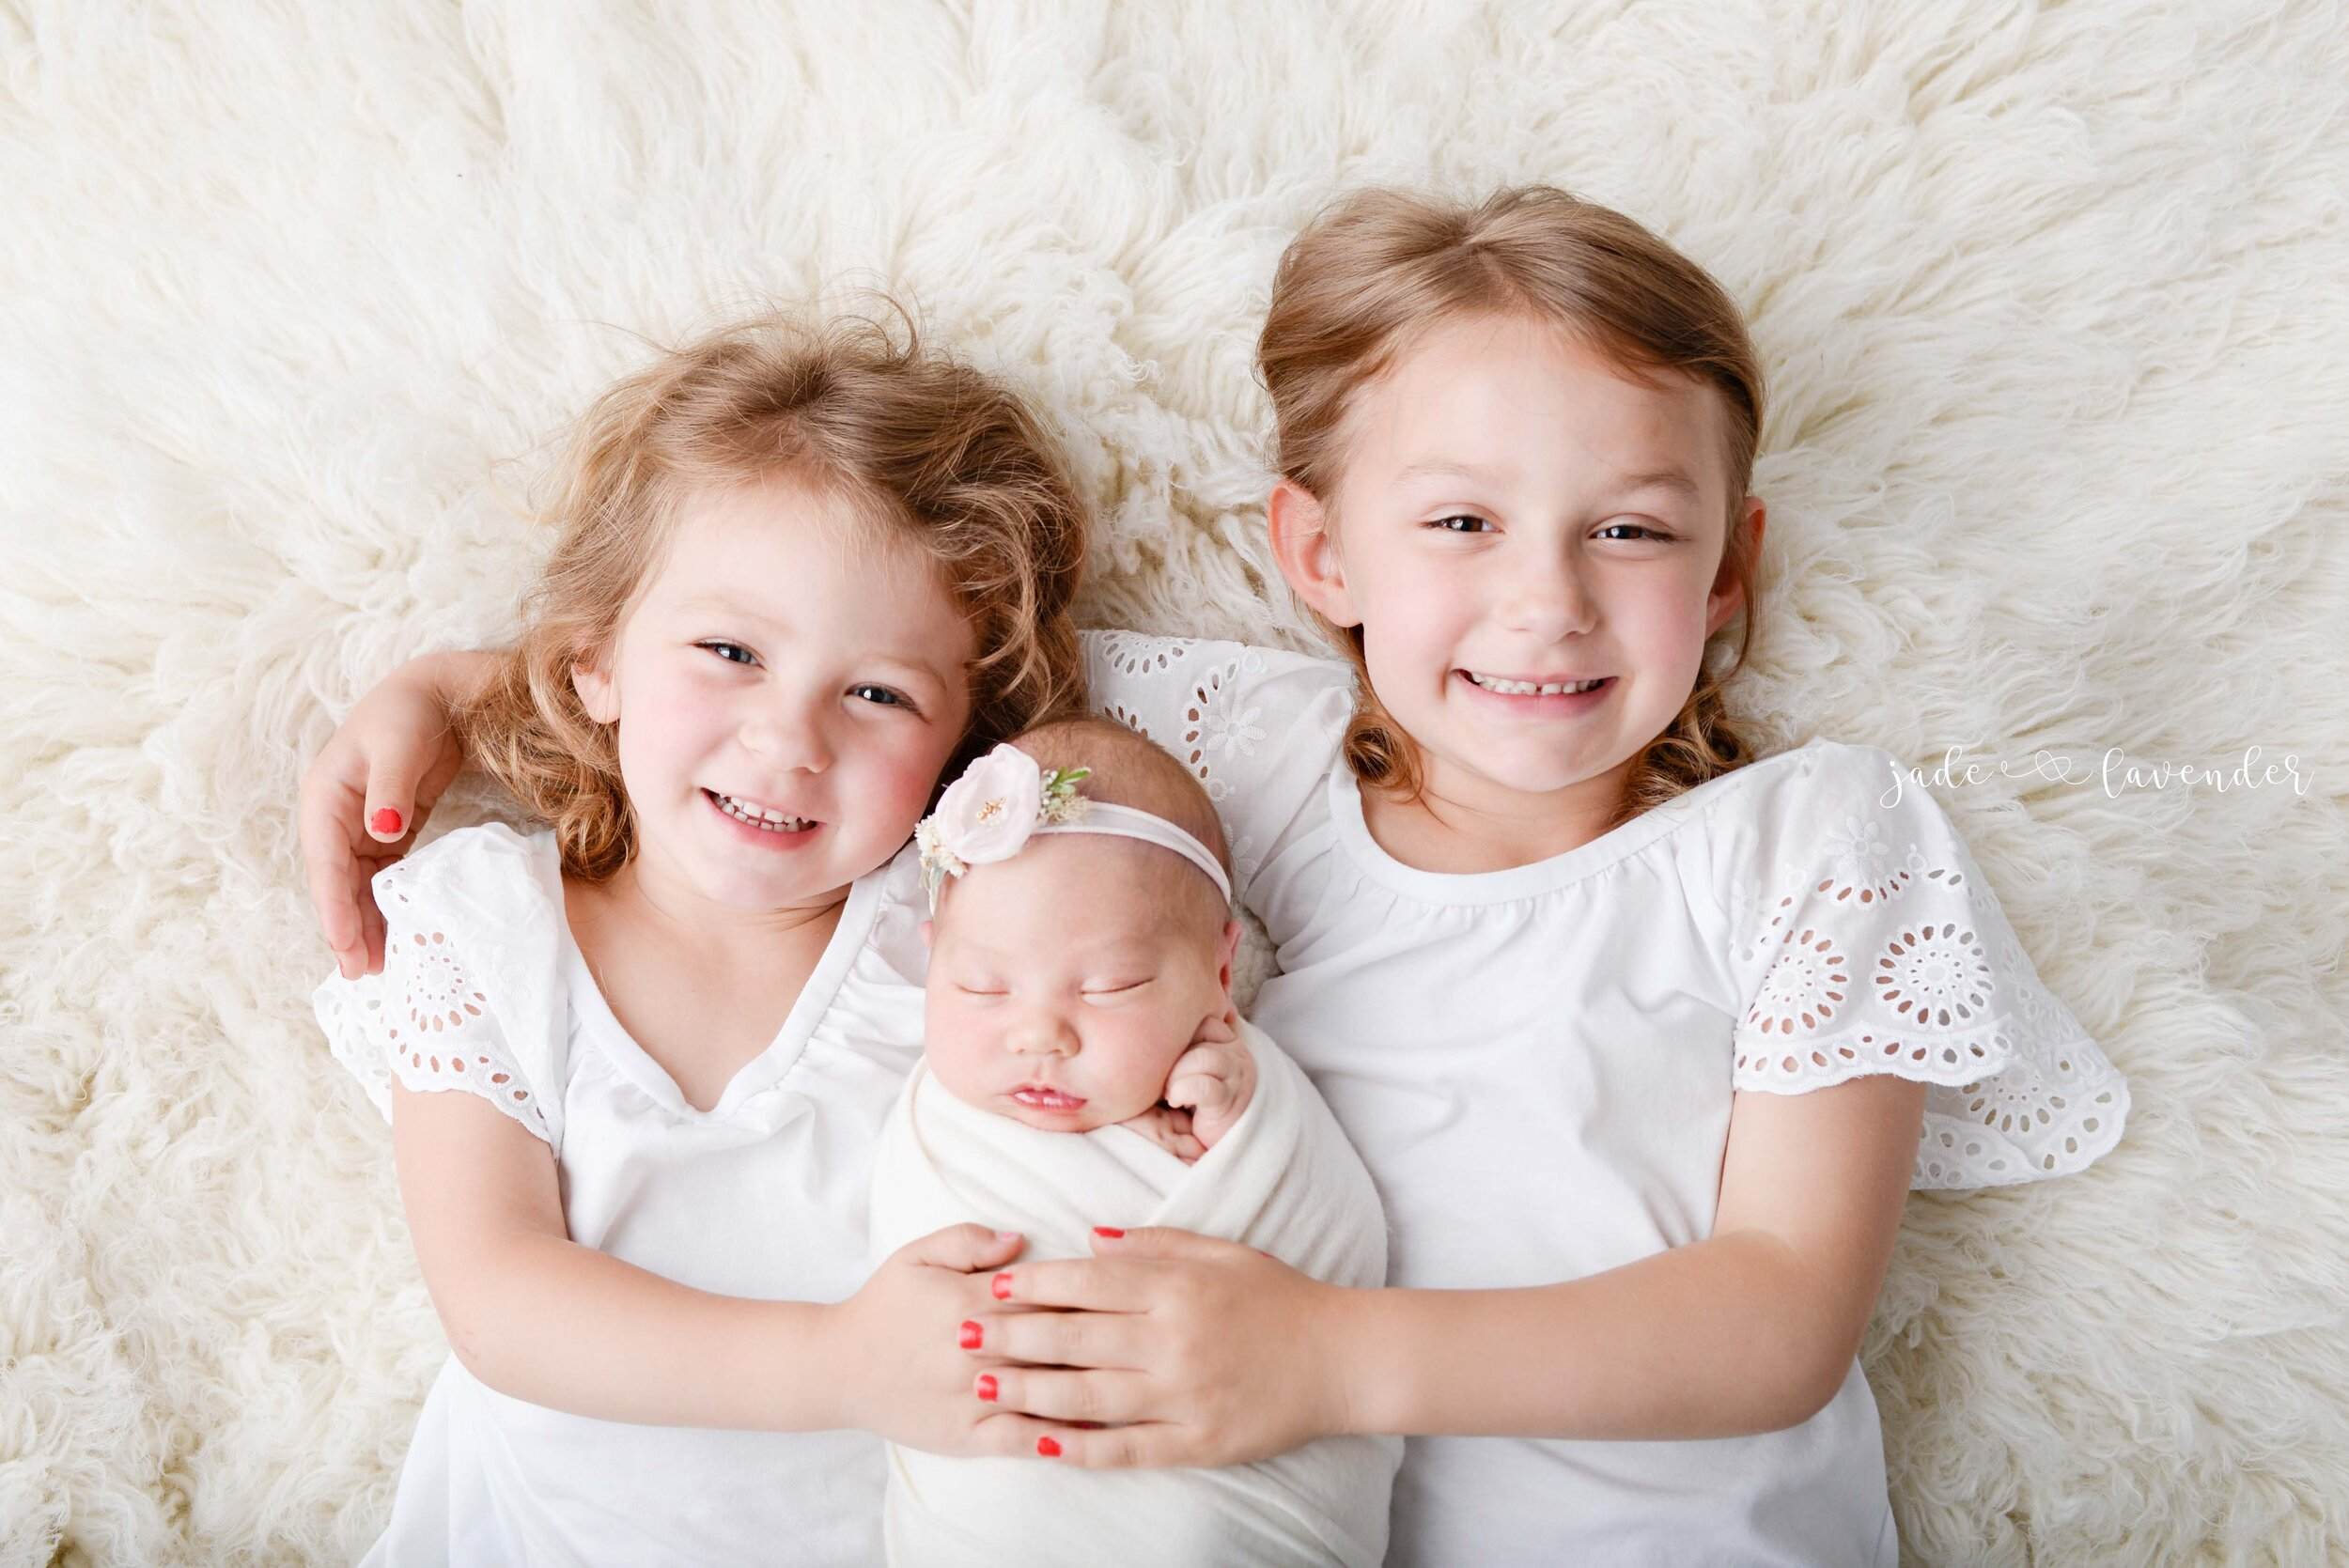 newborn-photography-baby-images-infant-photos-girl-floral-spokane-washington (5 of 6).jpg